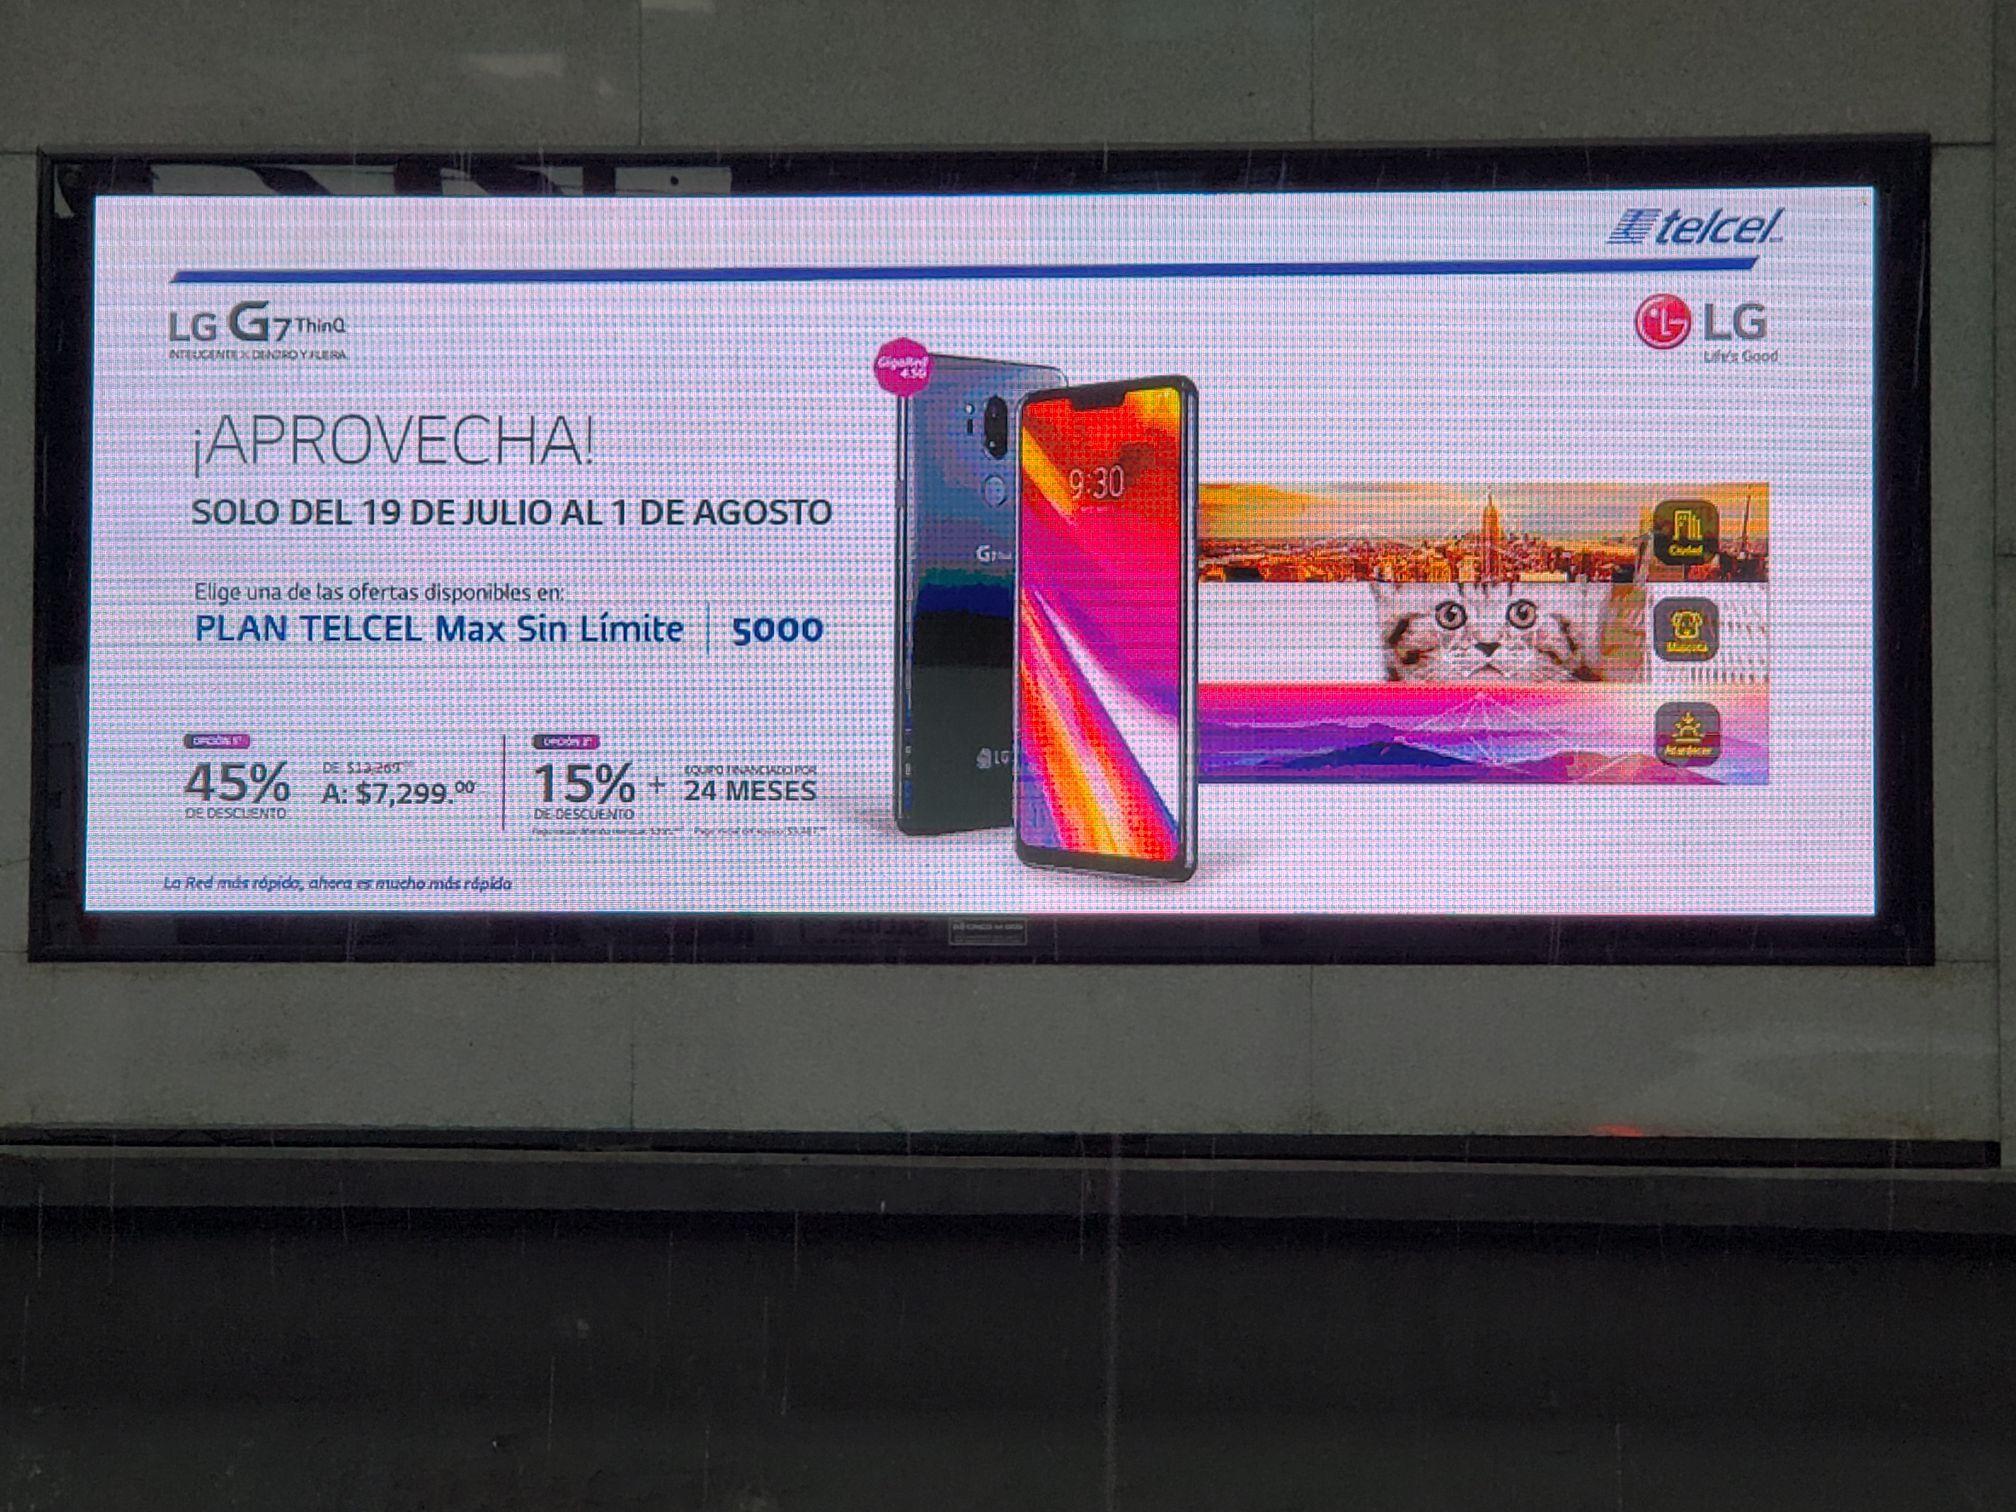 Telcel: LG G7 Thinq a $7,299 en plan sin límite 5000 a 24 meses